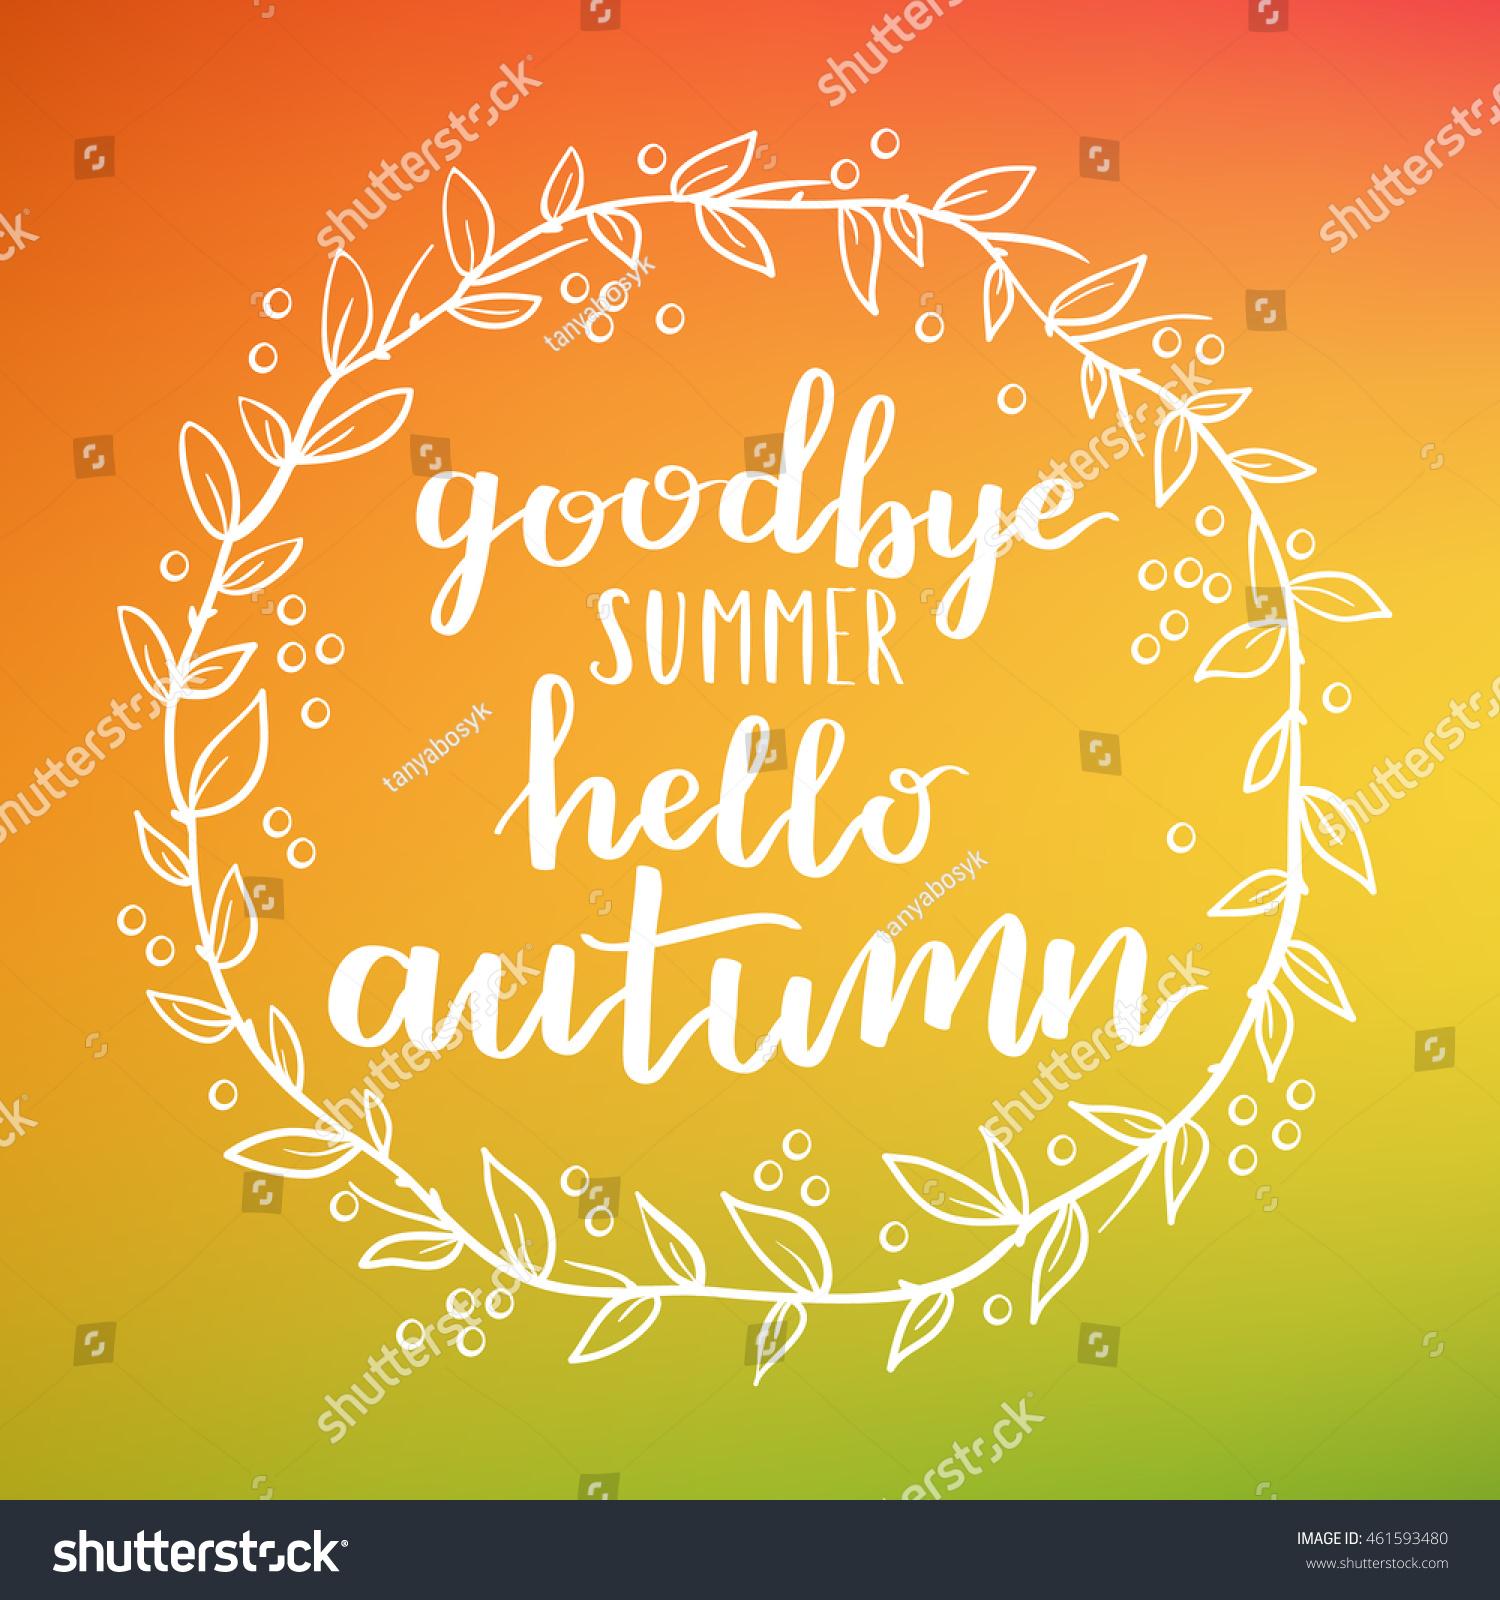 Goodbye Summer Hello Autumn Round Frame Stock Illustration 461593480 - Shutte...